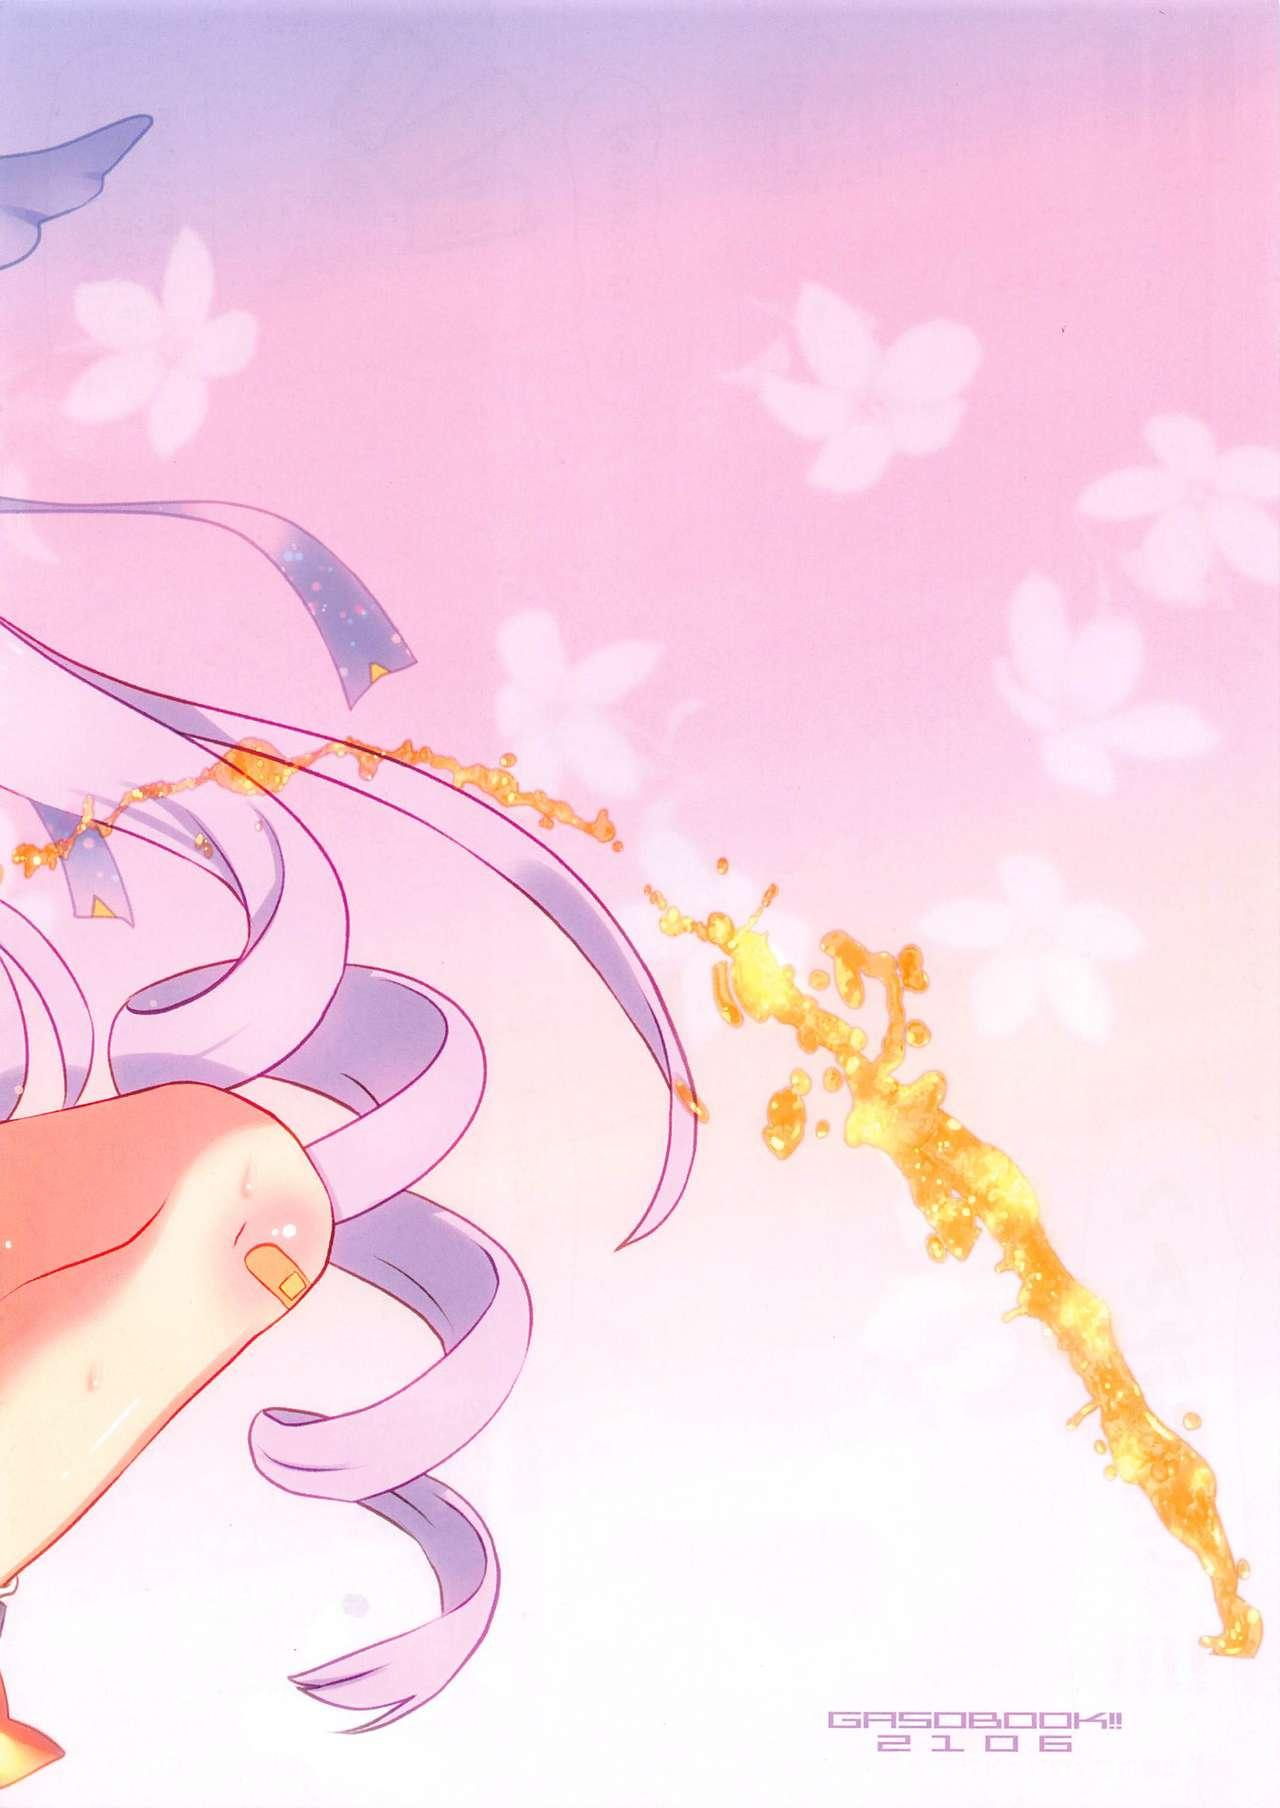 (Puniket 43) [GASOBooK!! (Matsumomo Mahiru)] ChibiConne [CC] Kyouka-chan (Princess Connect! Re:Dive) 11